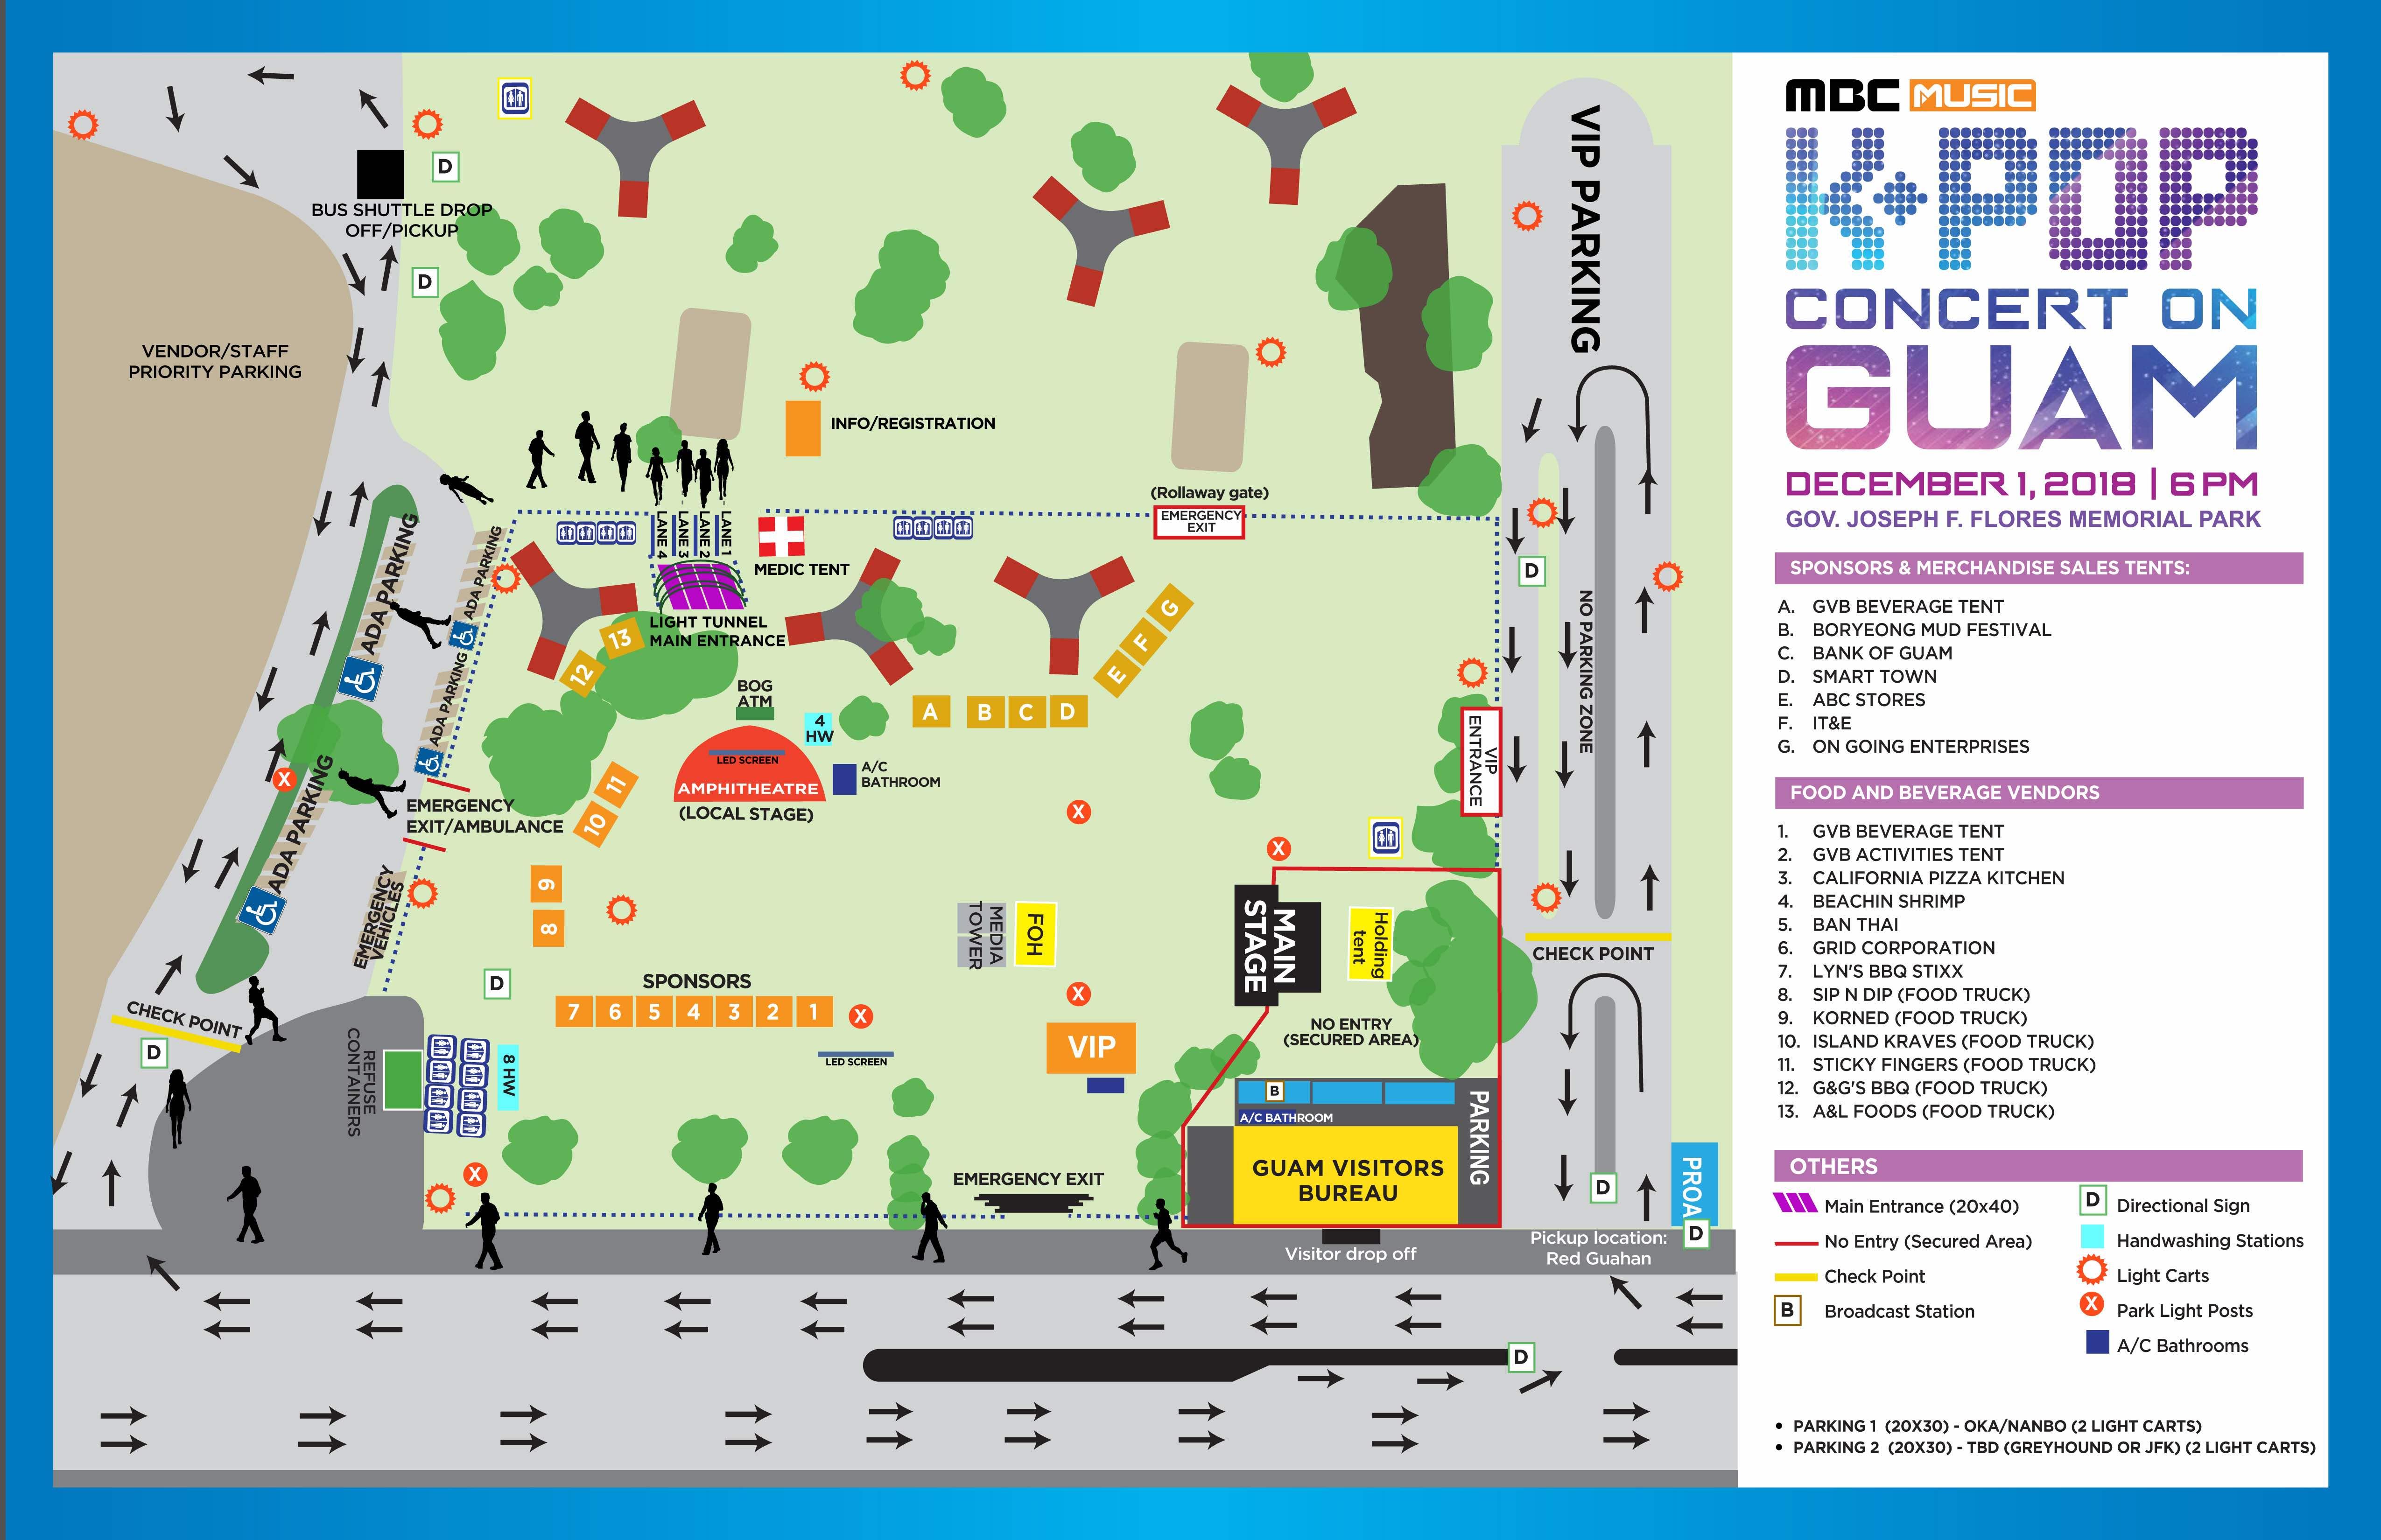 KPOP_Guam_sitemap